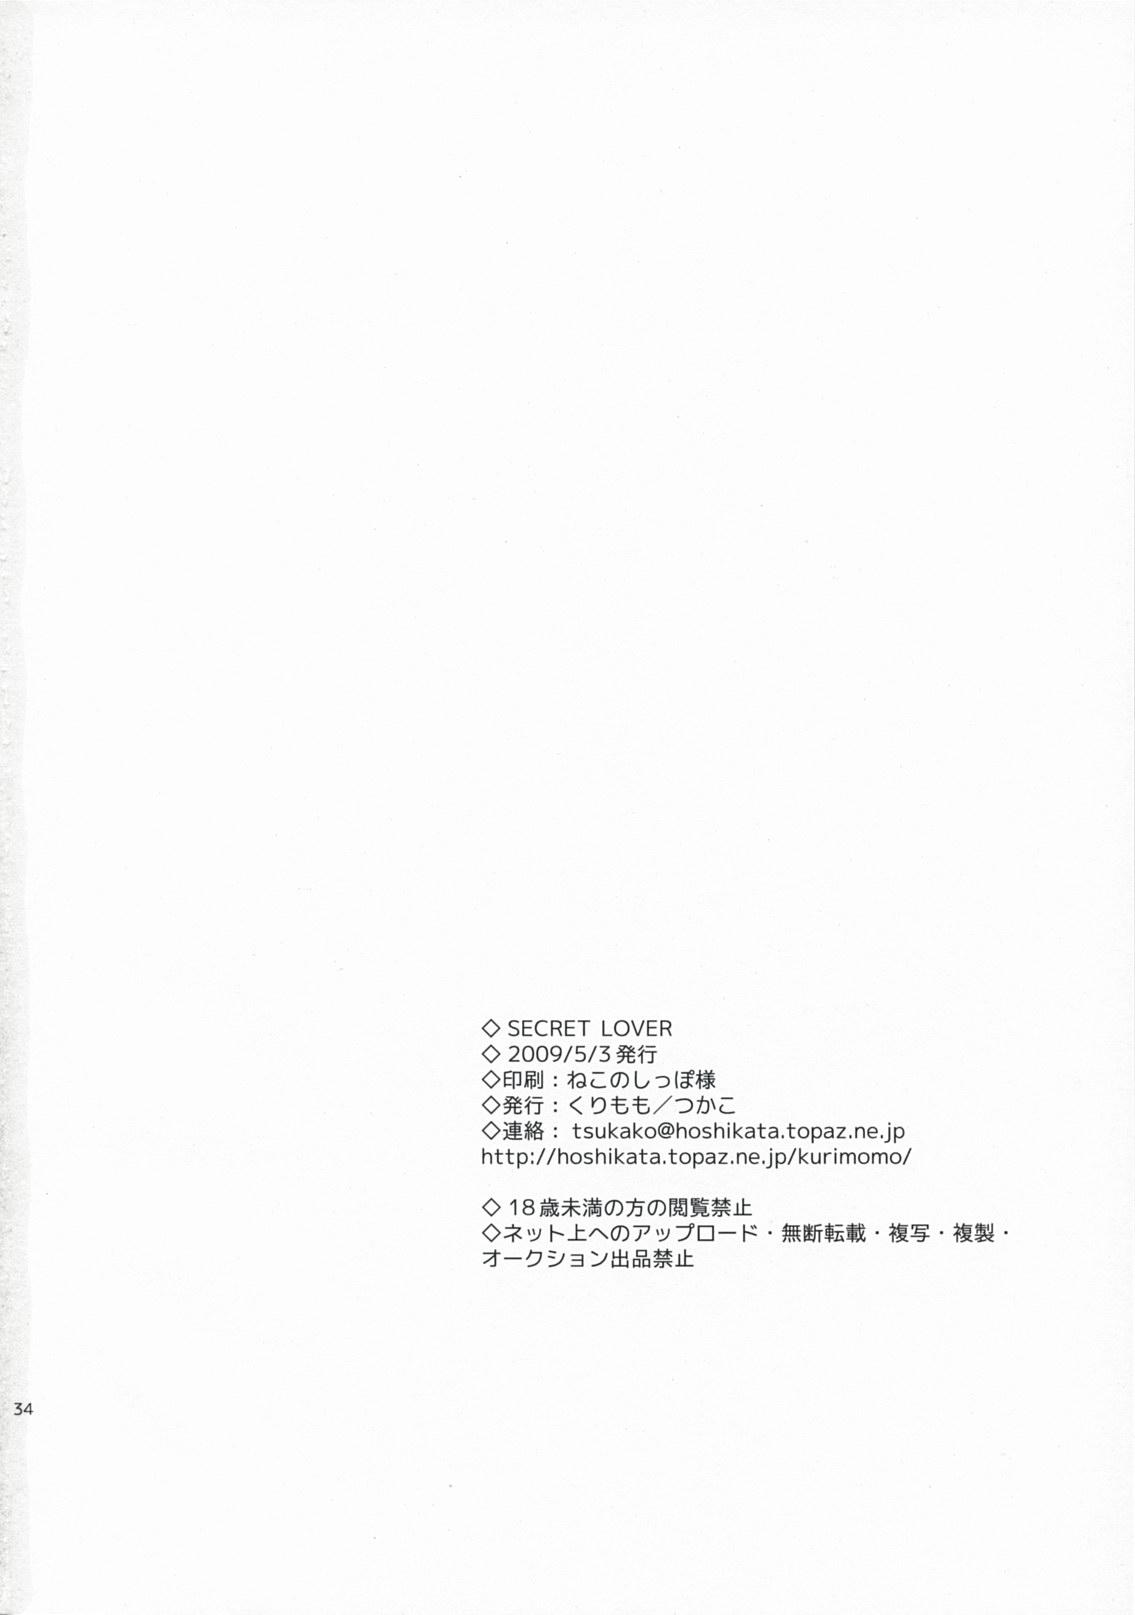 63412_kurimomo_www.hentairules.net_33_123_40lo.jpg